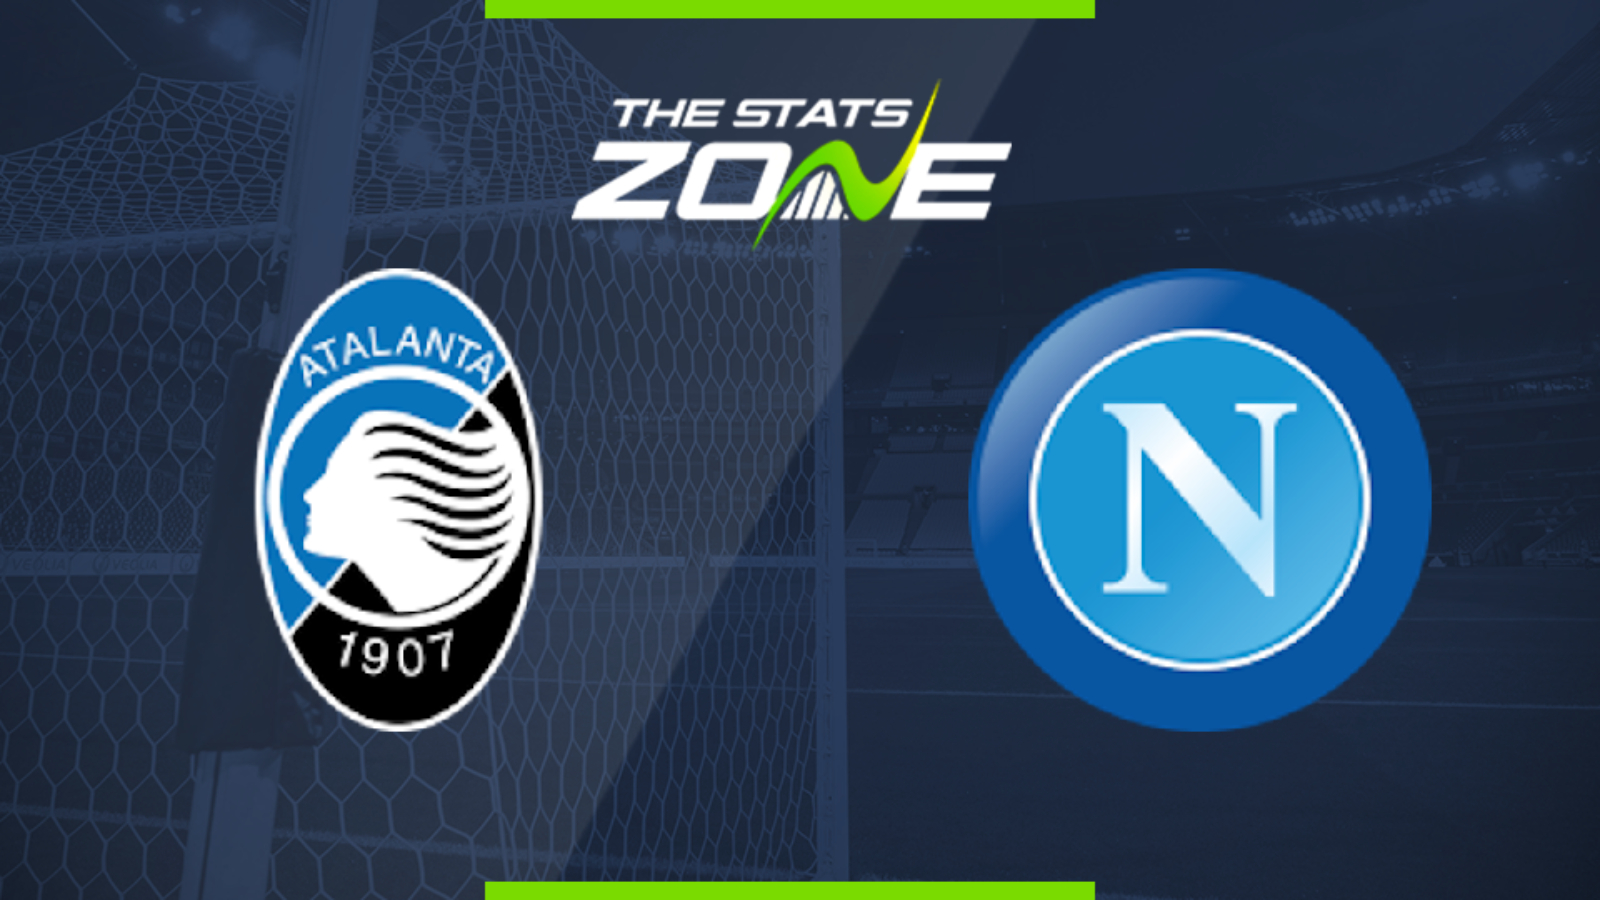 Serie A 2019-20 Matchday 29 Atalanta vs Napoli Prediction   Napoli- Atalanta